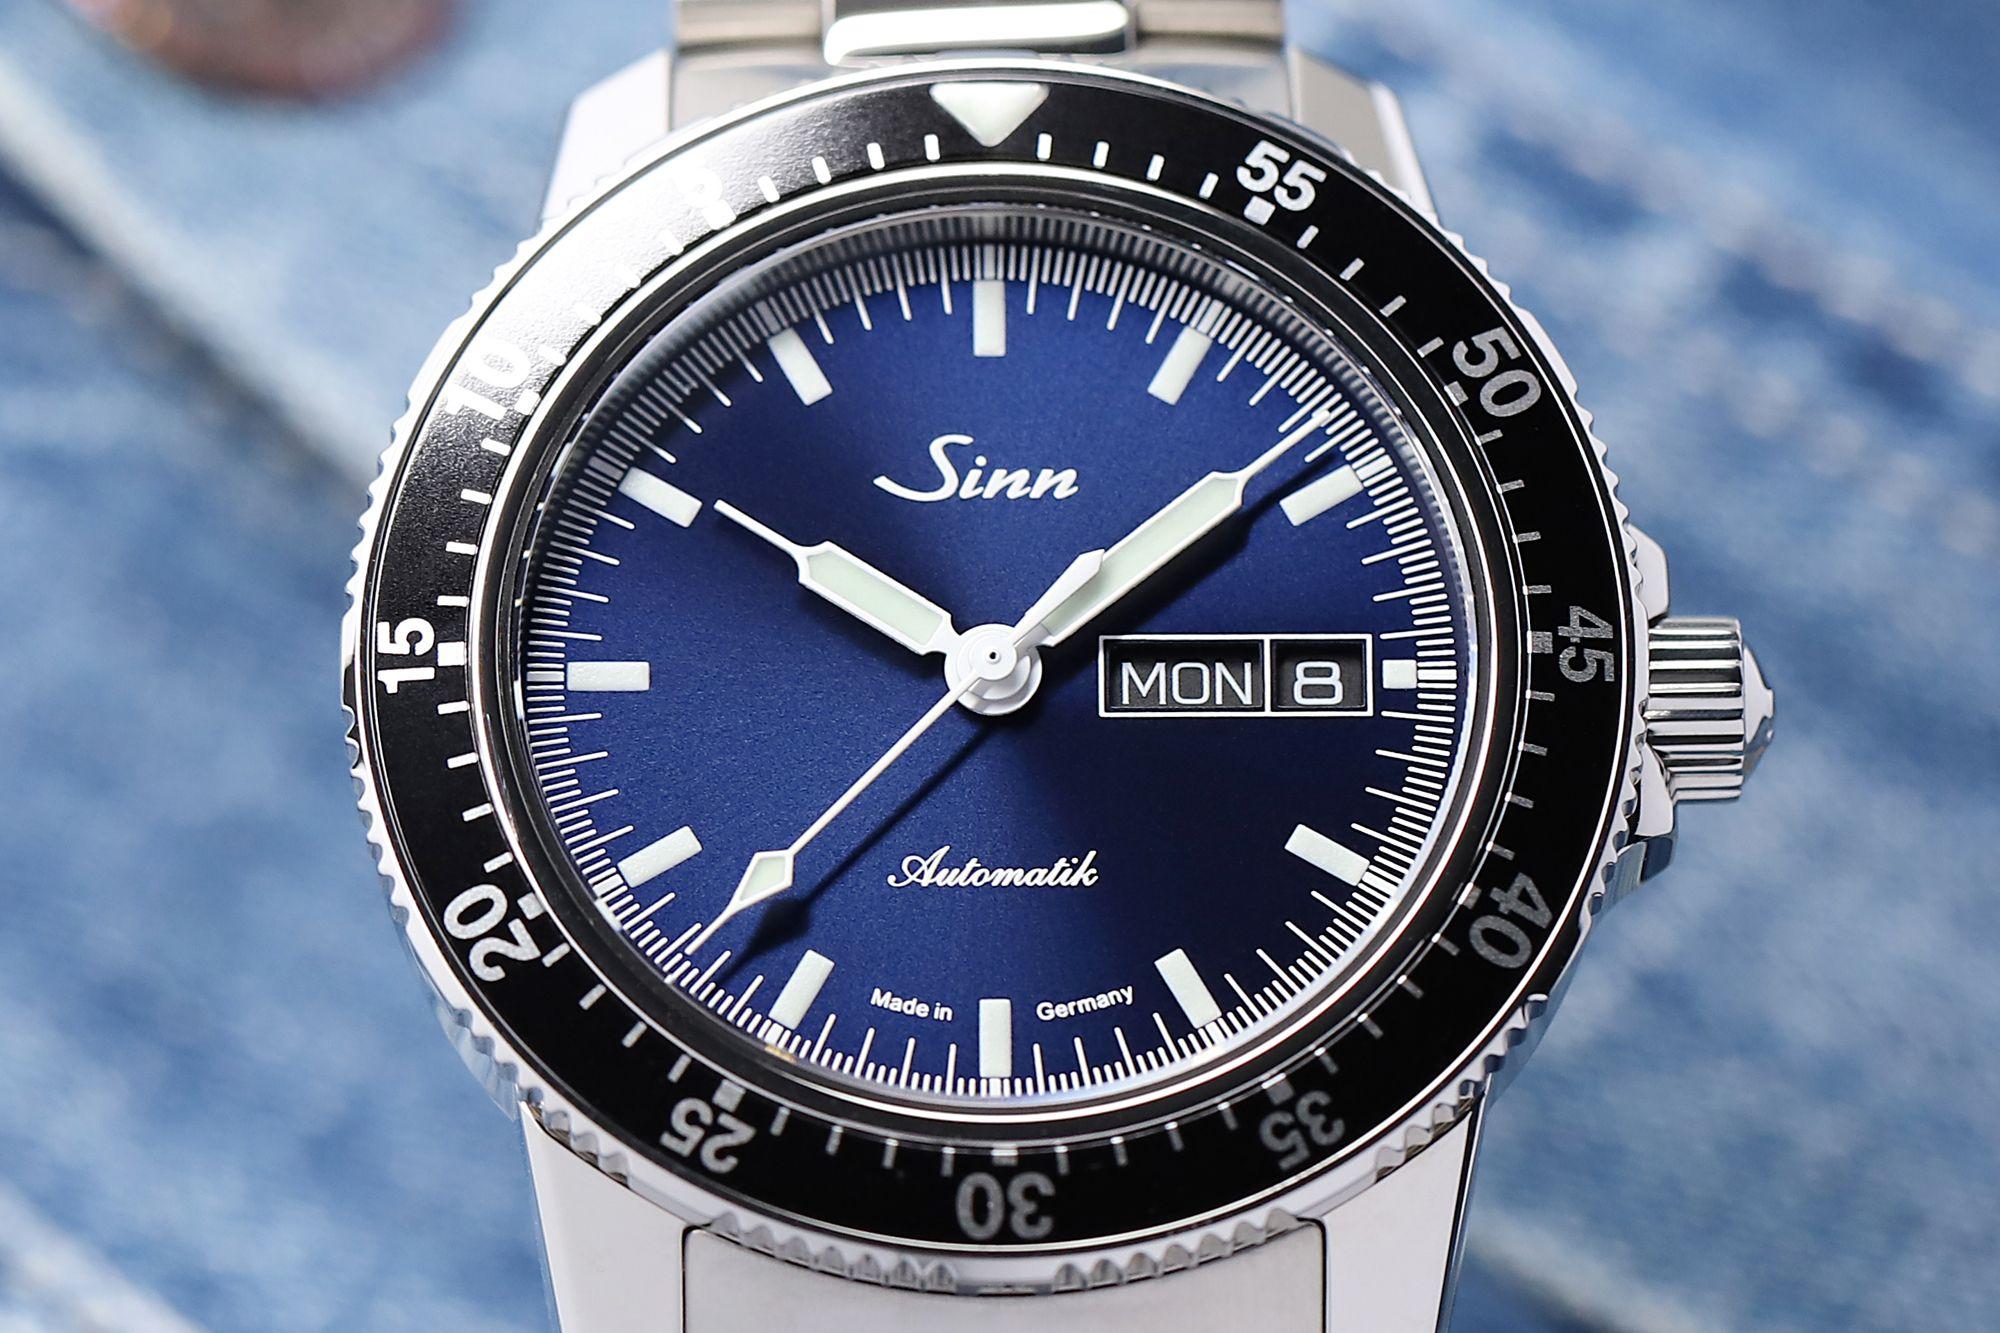 ba51be9b7d9d28 SINN 104 St Sa I B - the classic pilot watch with dark blue dial / SINN 104  St Sa I B - la montre de pilote classique avec cadran bleu foncé ...